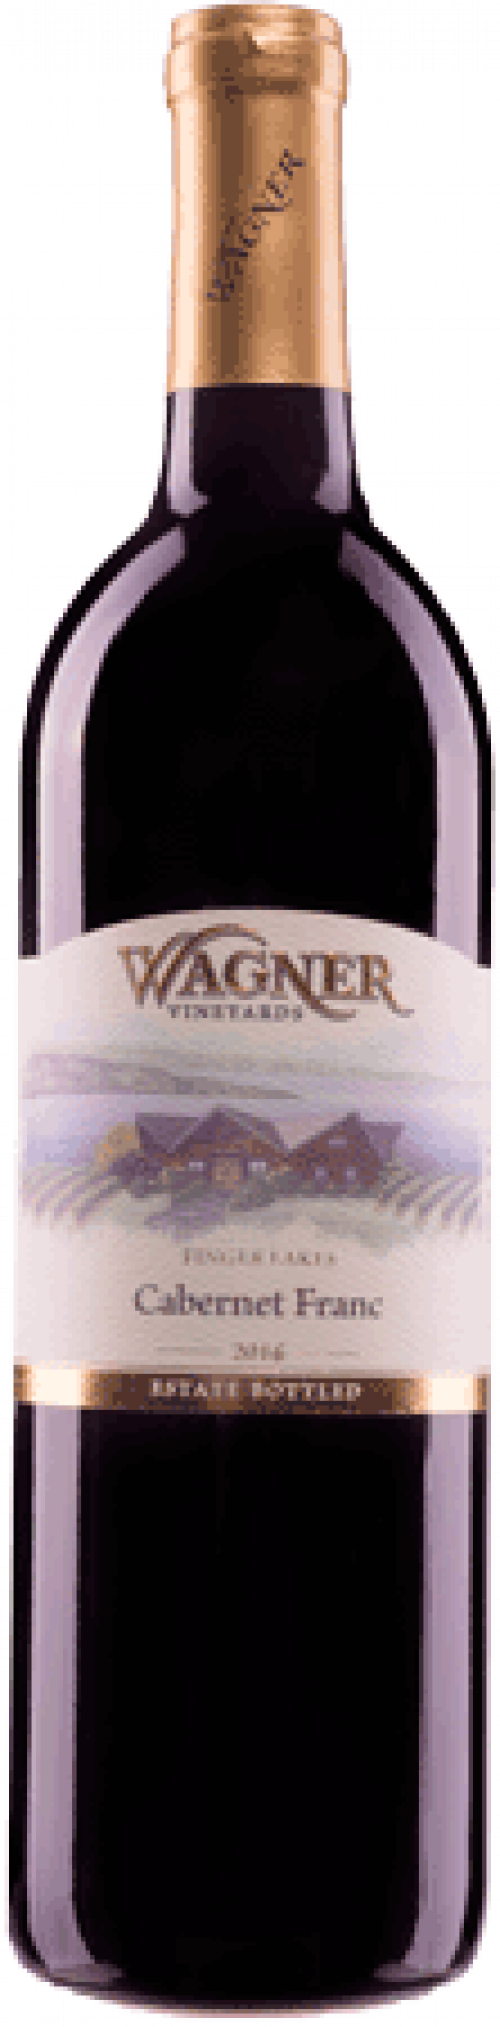 2017 Wagner Cabernet Franc 750ml